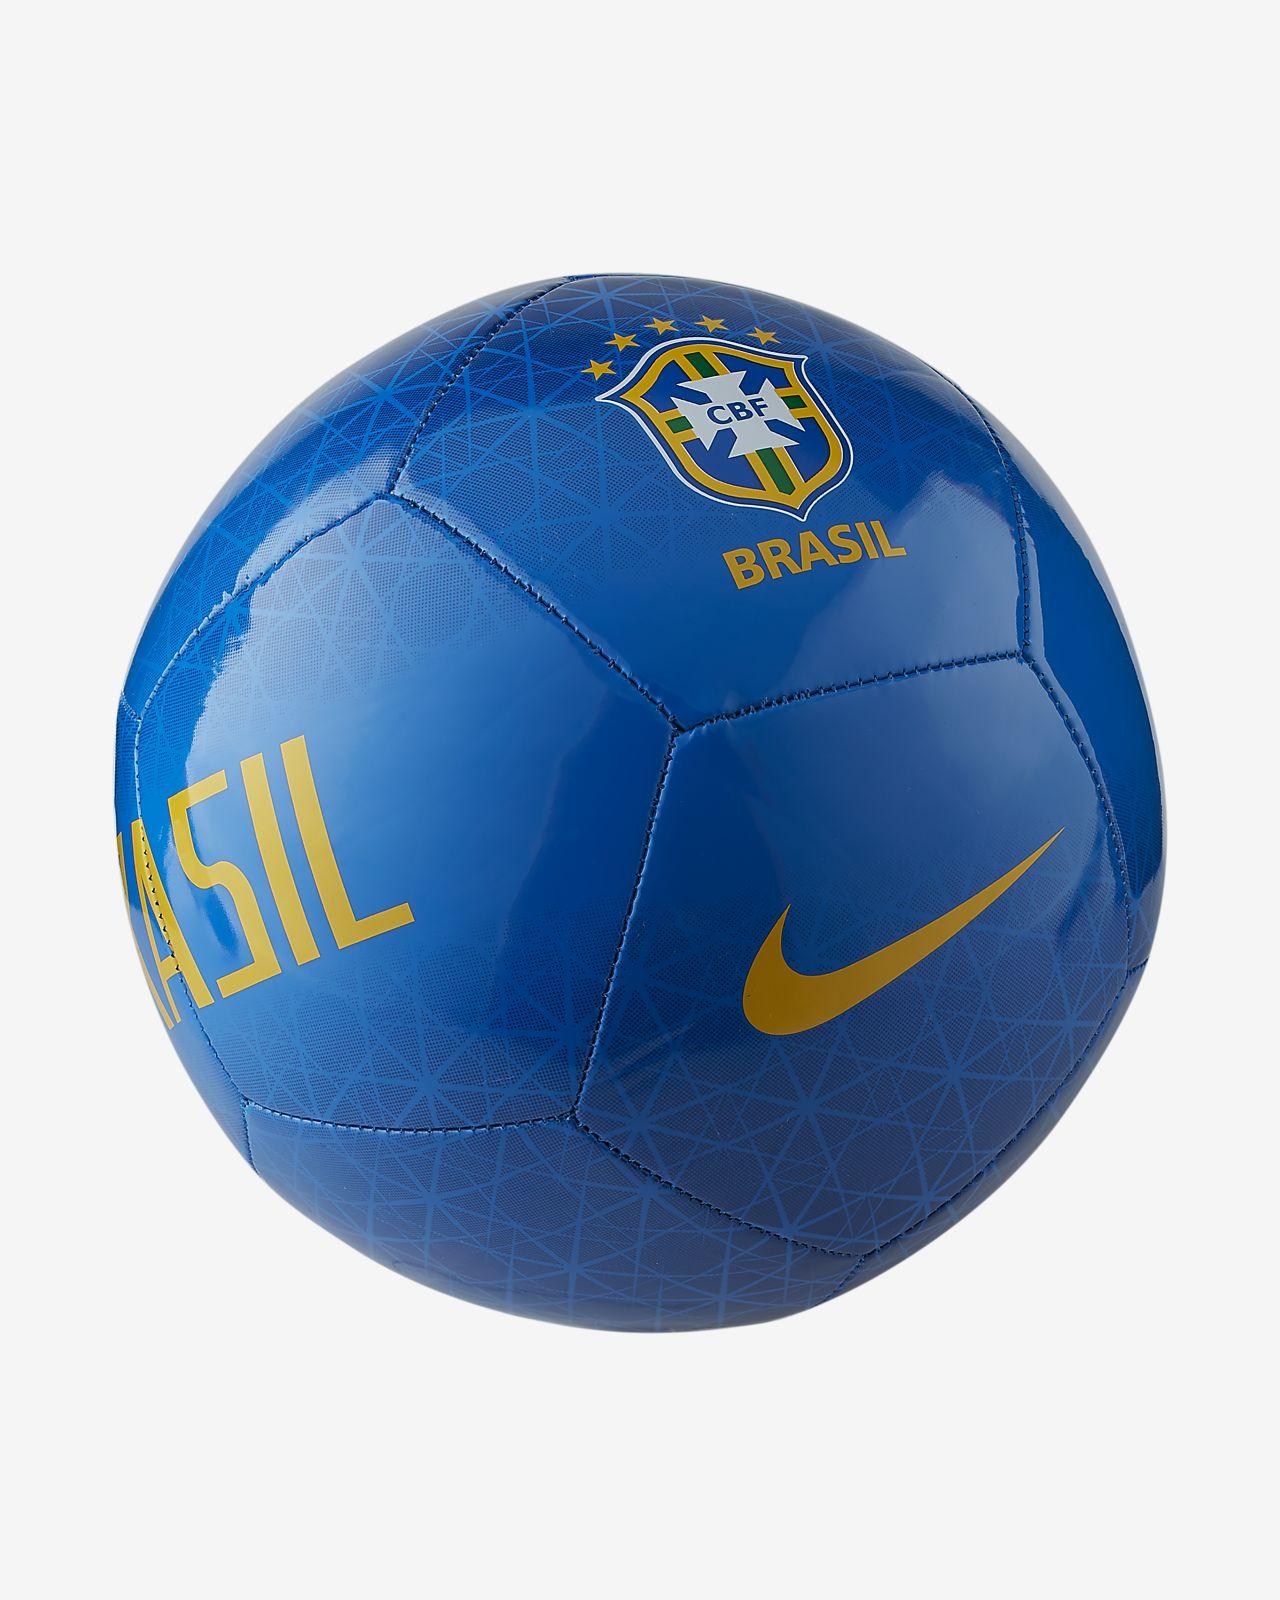 Brazil Pitch Football